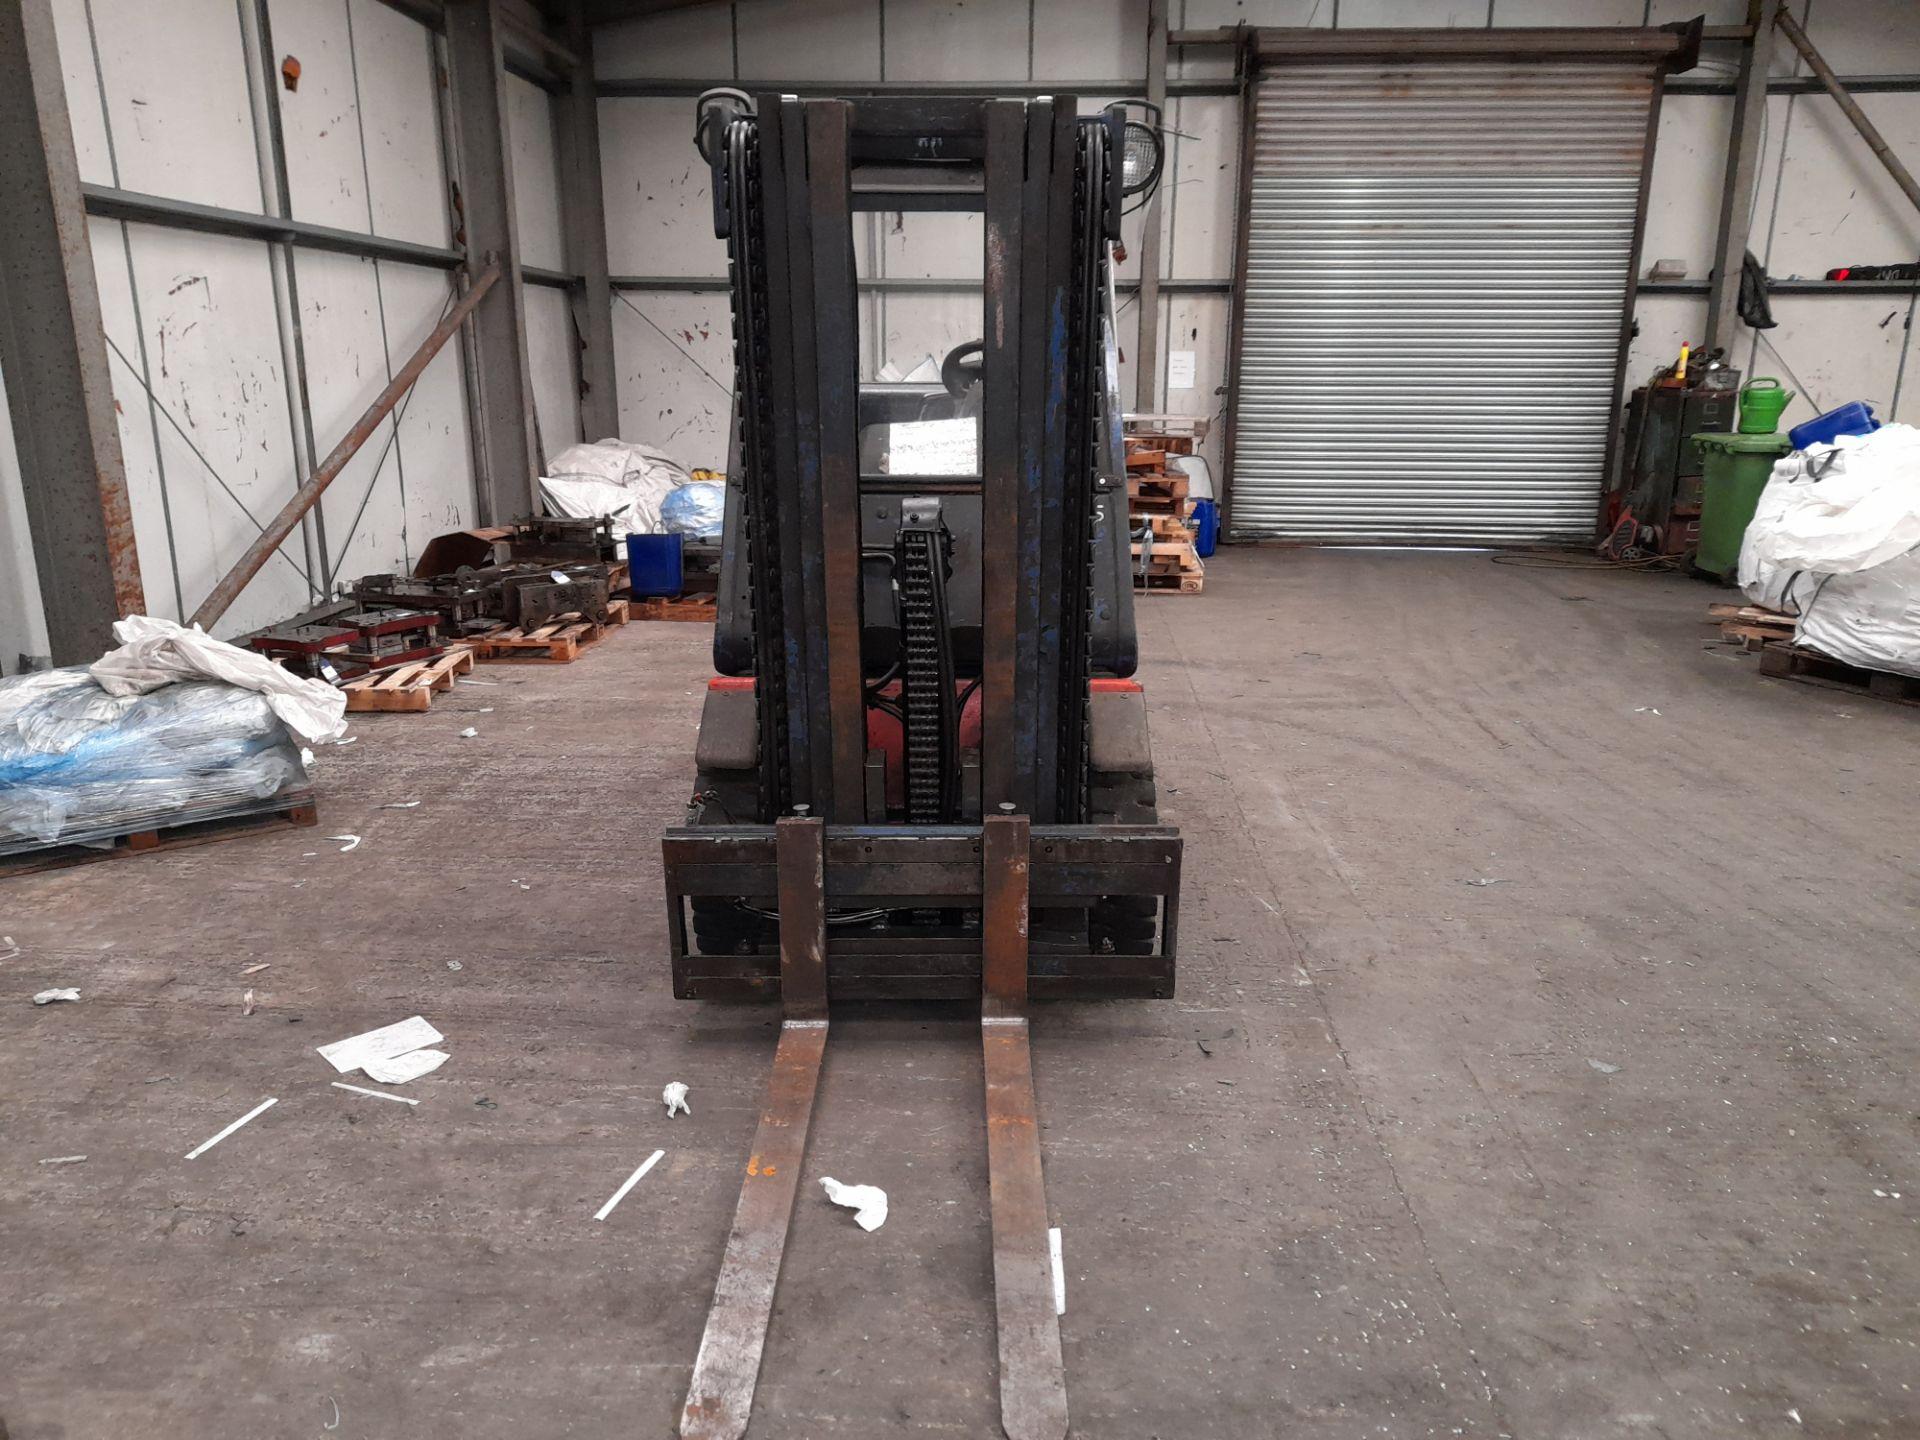 Linde H25T-02 LPG Forklift Truck, 2500kg Capacity, Triple Mast, Side Shift, Lift Height 3925mm, - Image 7 of 9